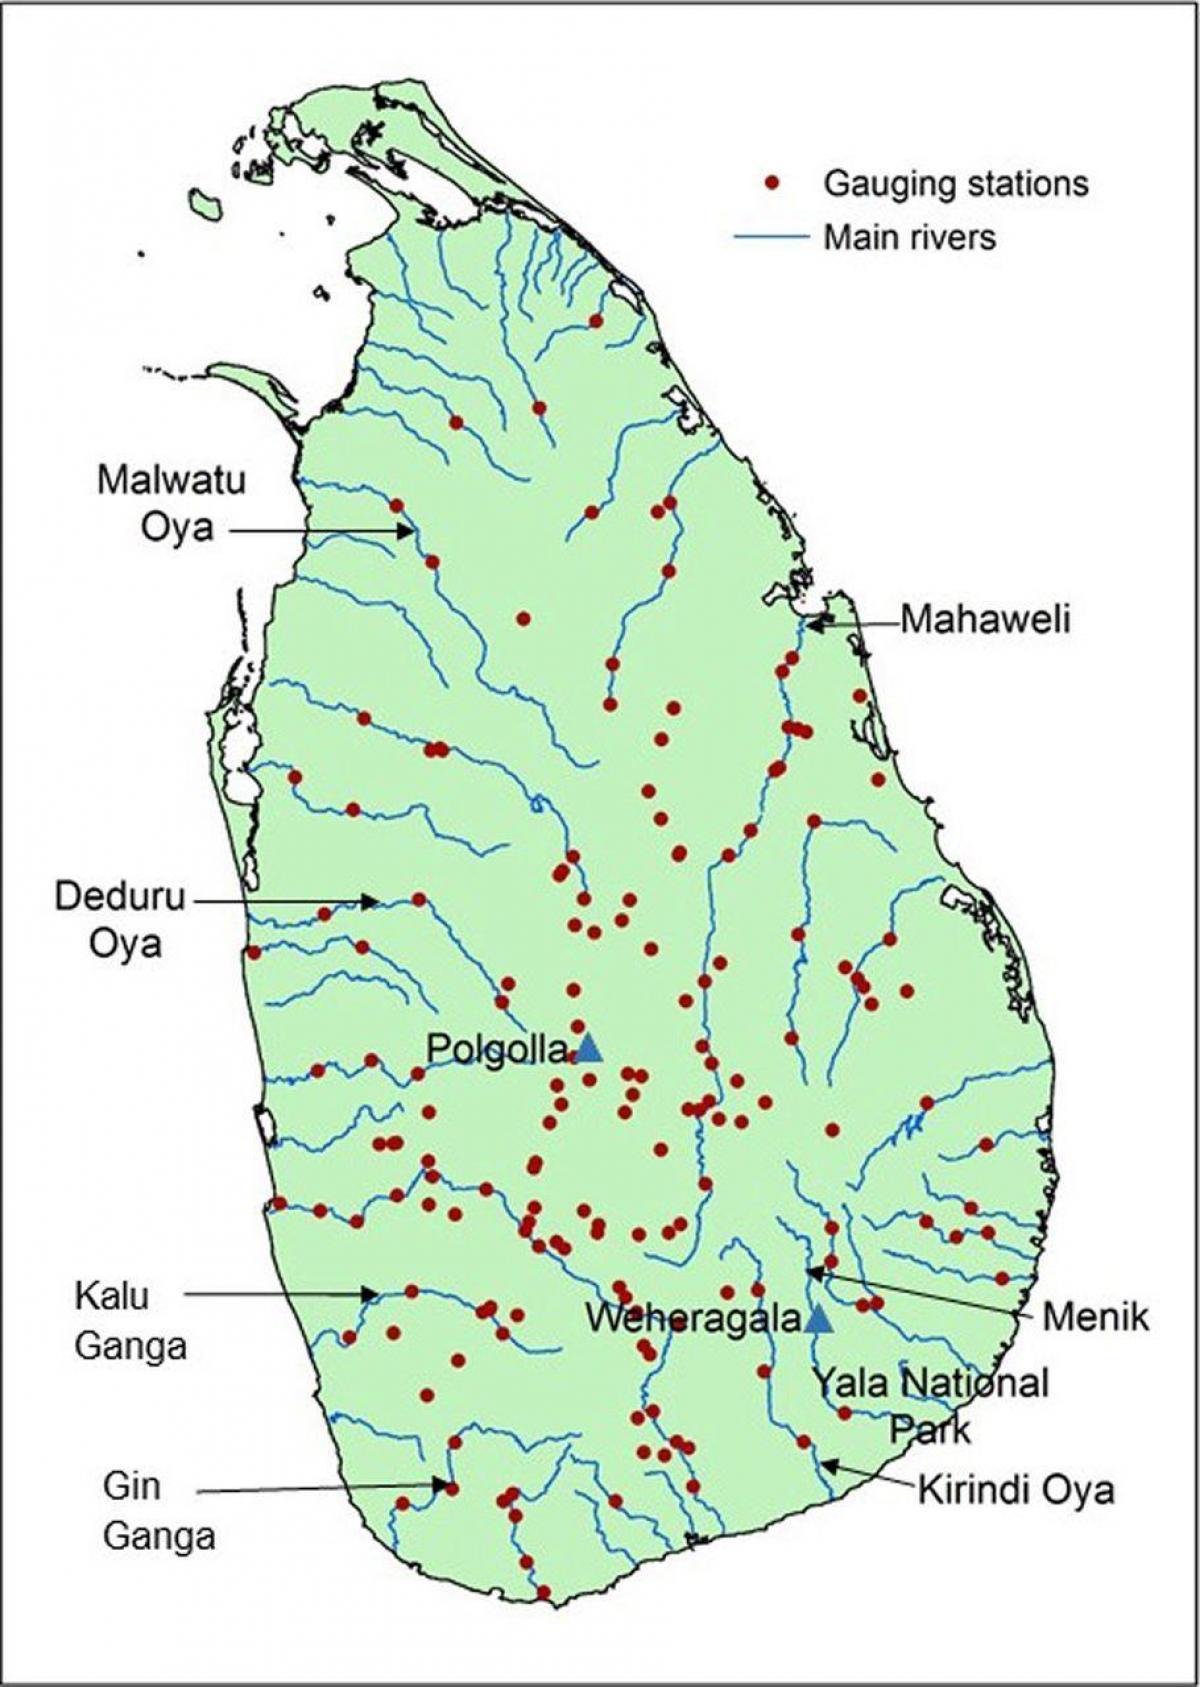 Mahaweli Joen Kartta Sri Lanka Nayta Kartta Mahaweli Joen Kartta